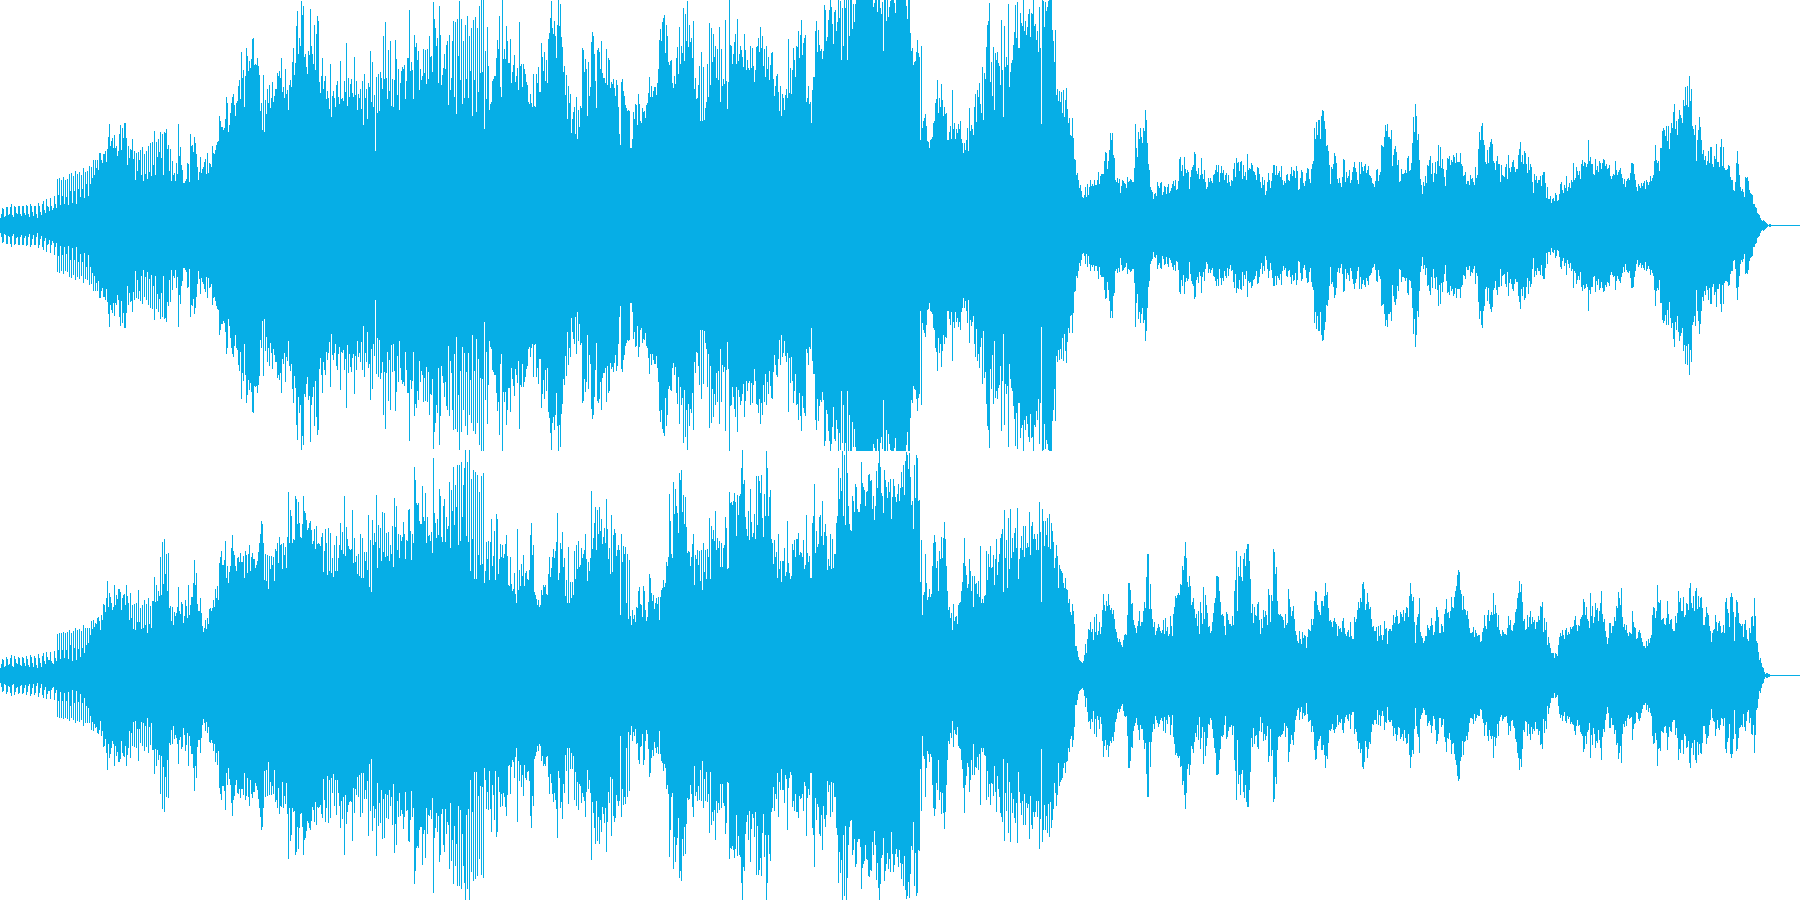 EDM   少しドローンなクラブミュー…の再生済みの波形